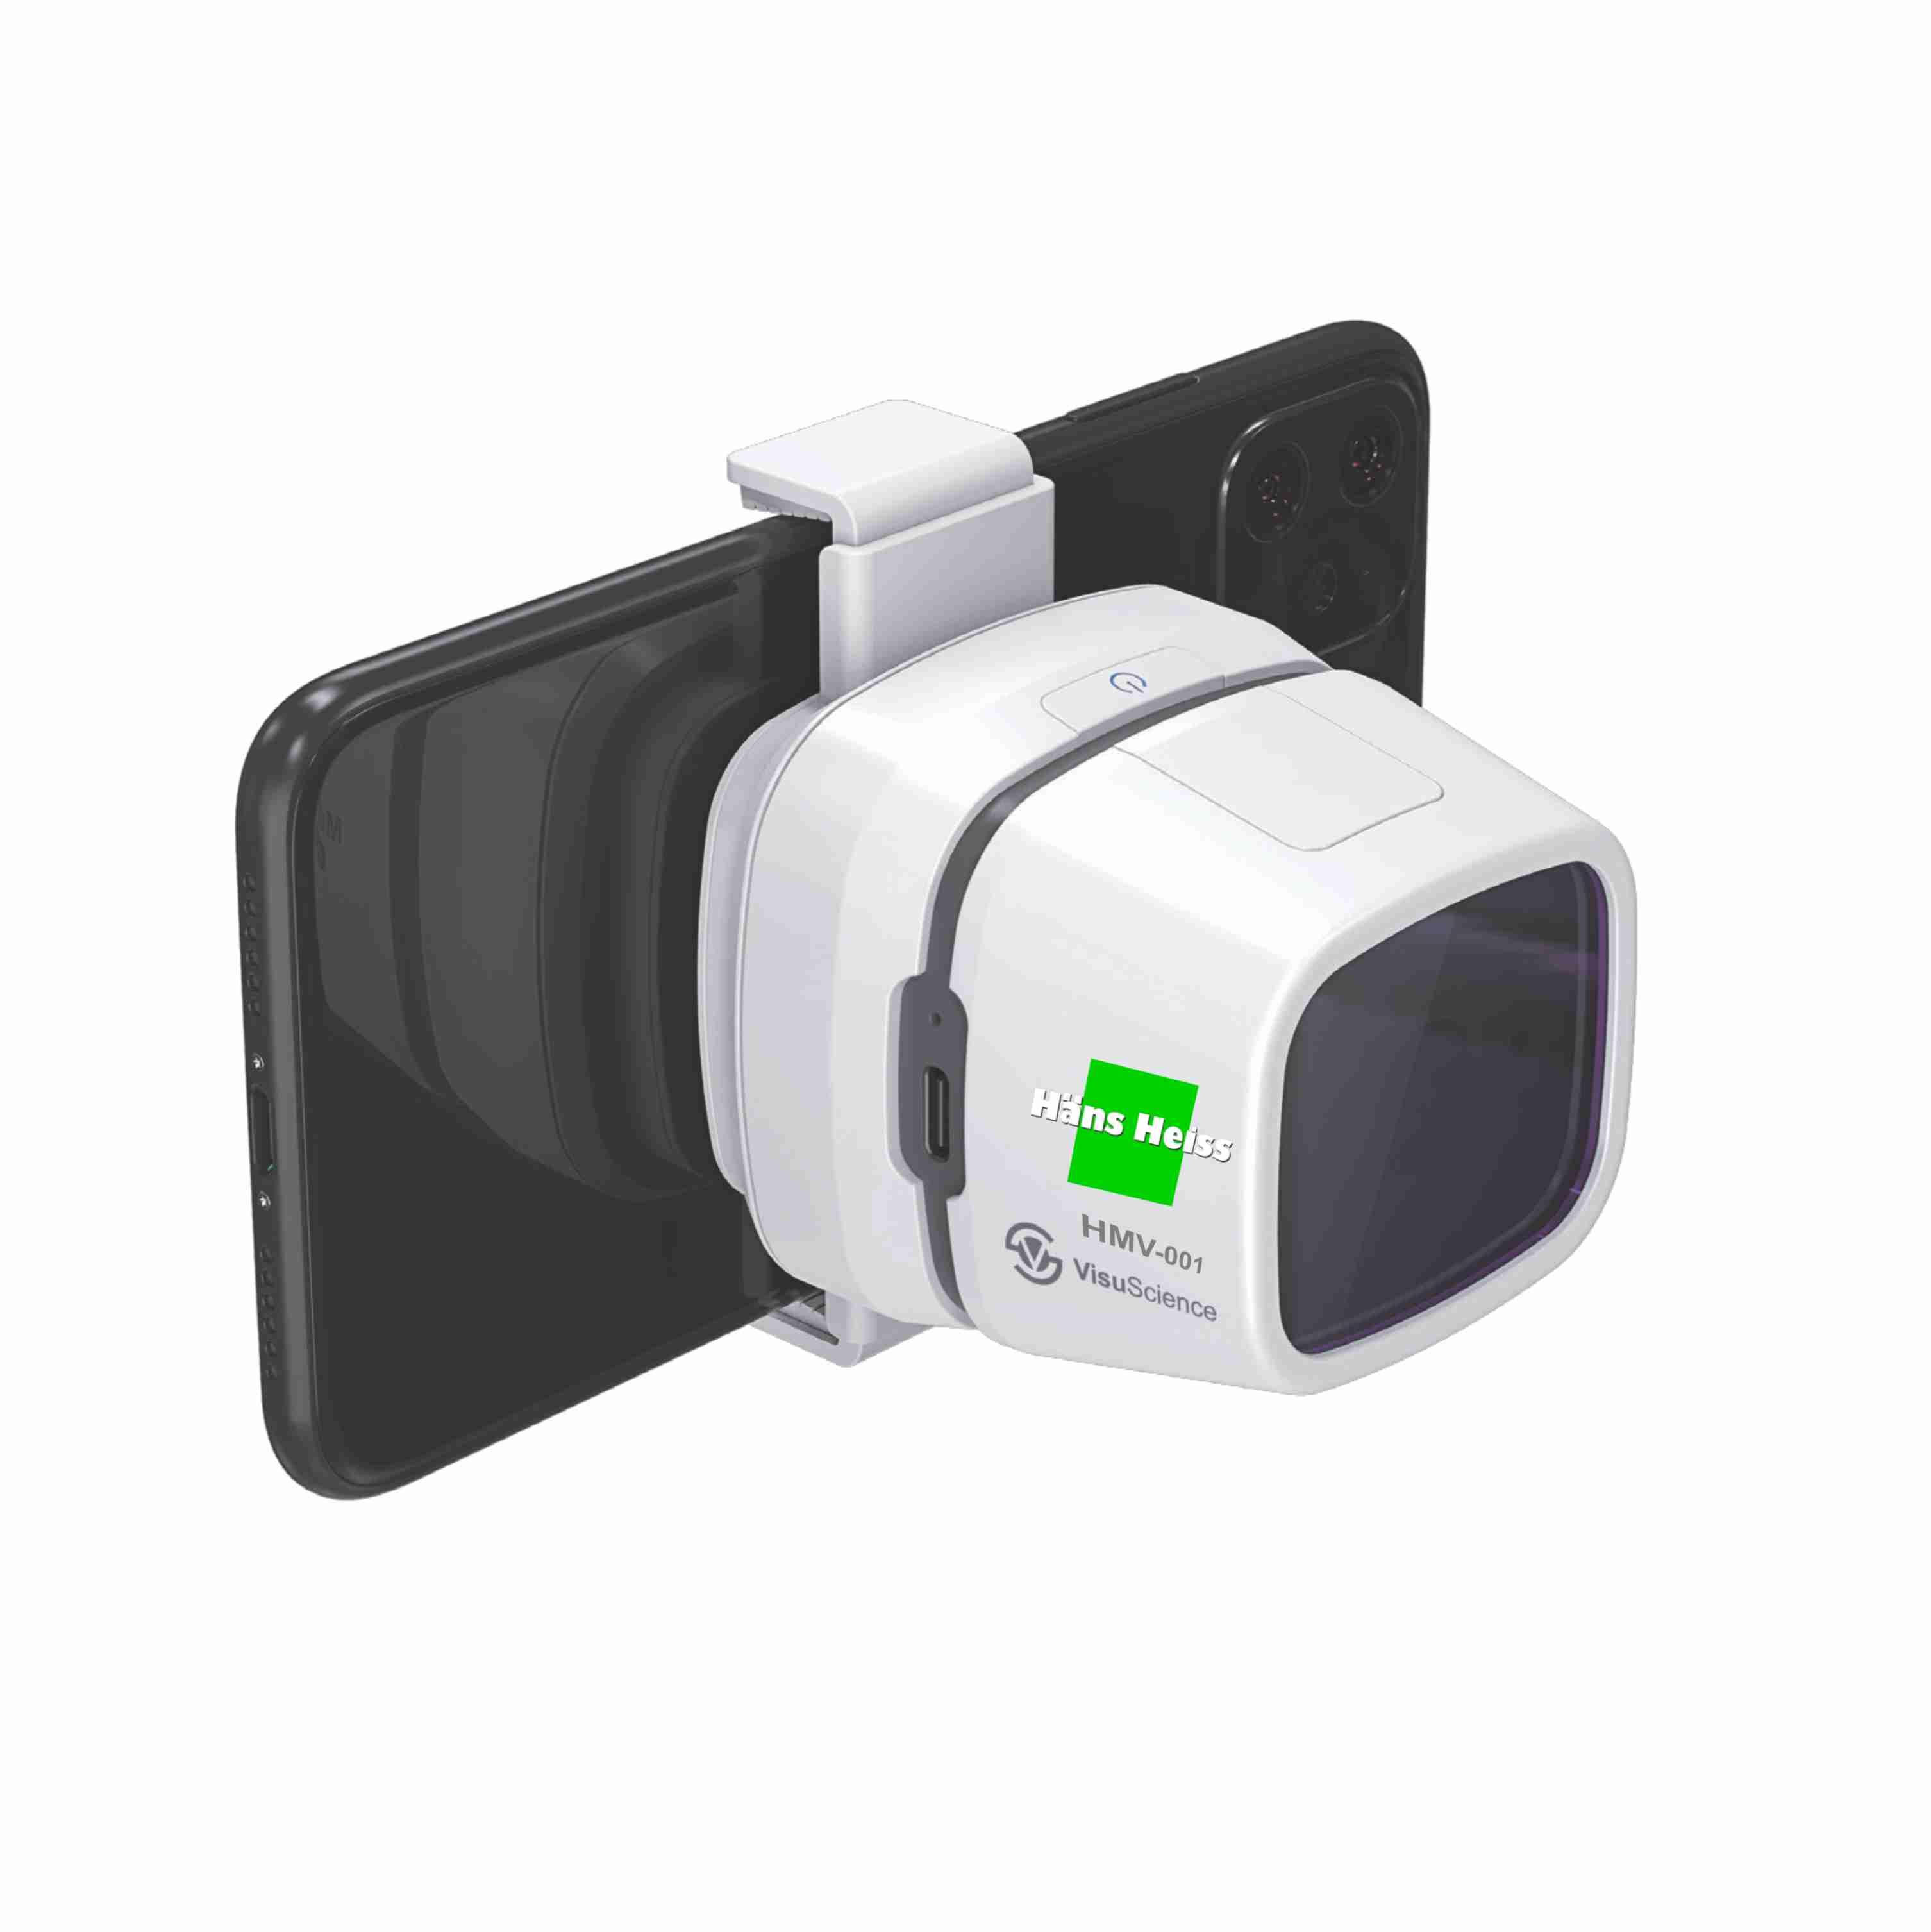 Meibomian Gland Imaging Camera